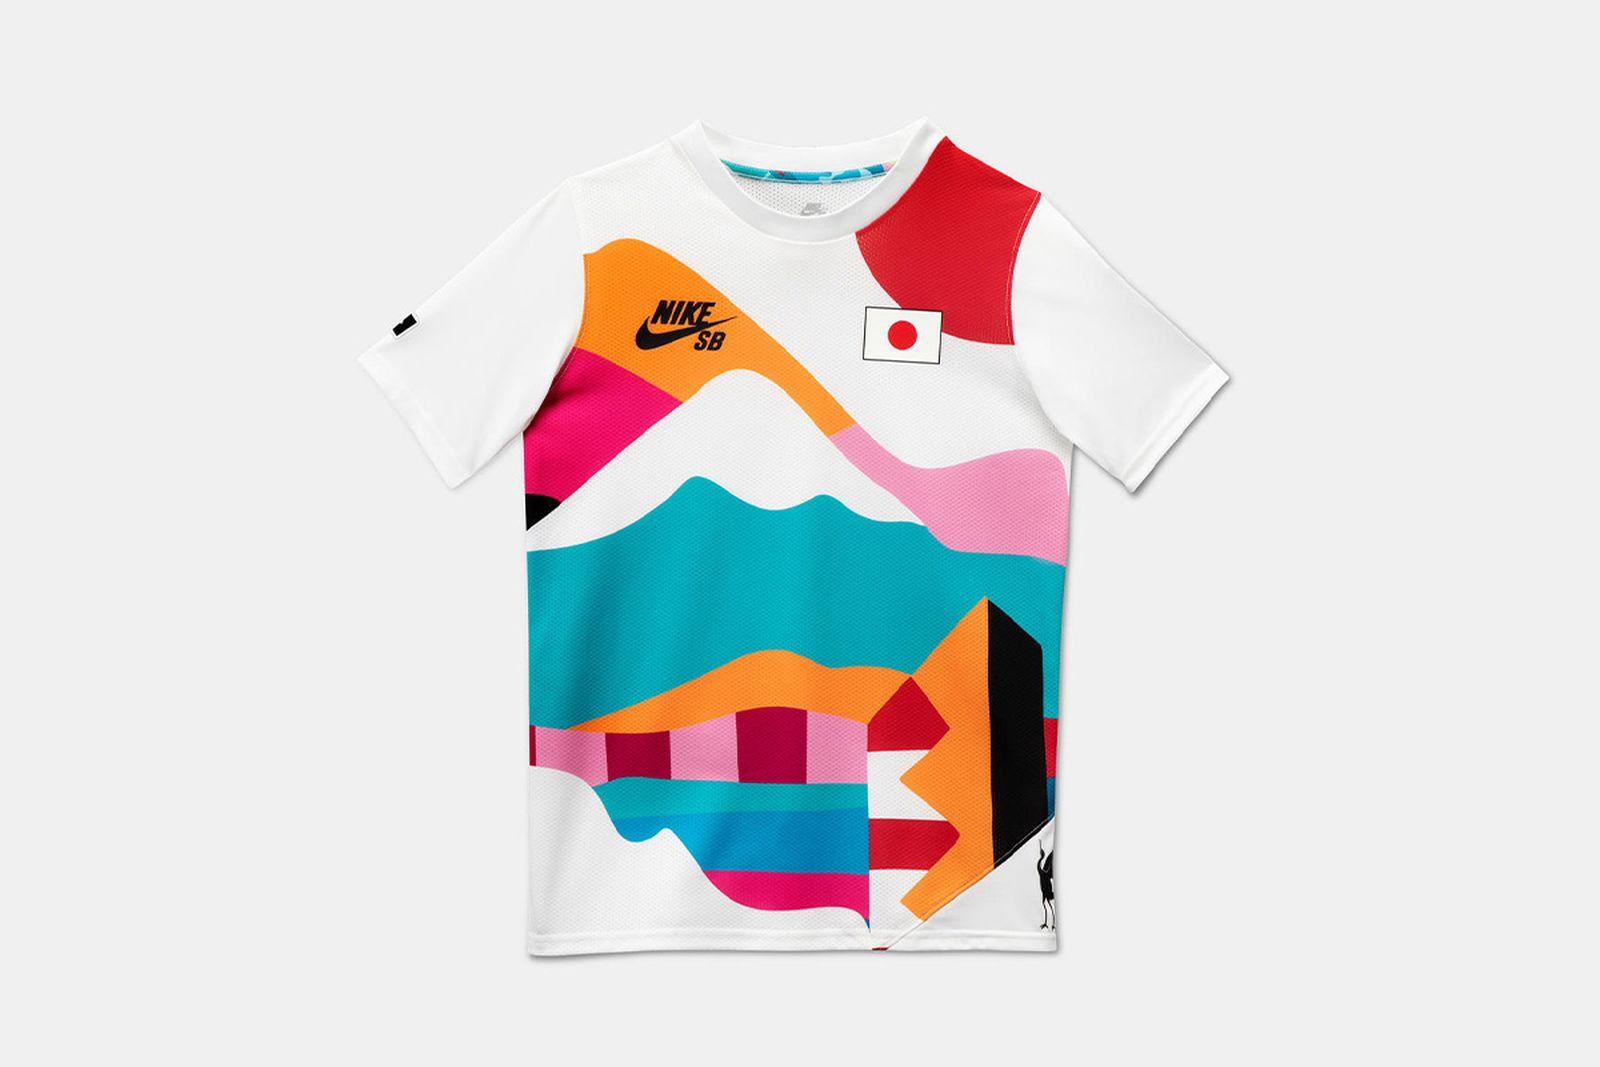 nike-sb-parra-federation-kits-tokyo-olympics-03